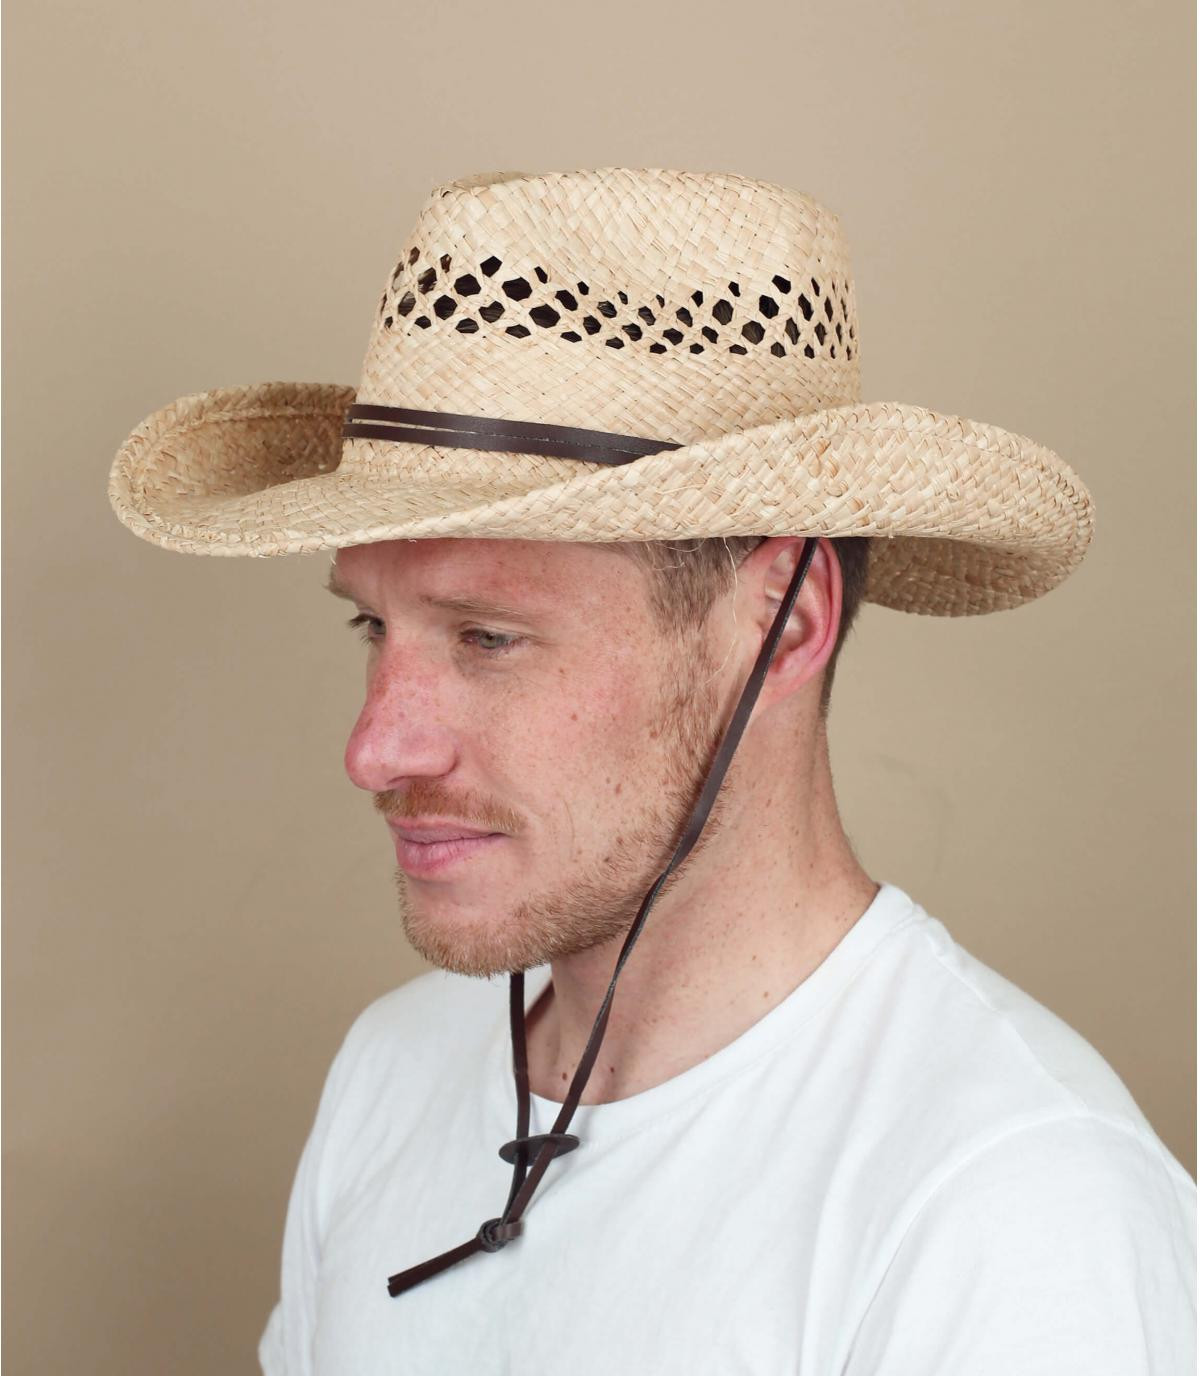 Stetson Cowboy Strohhut